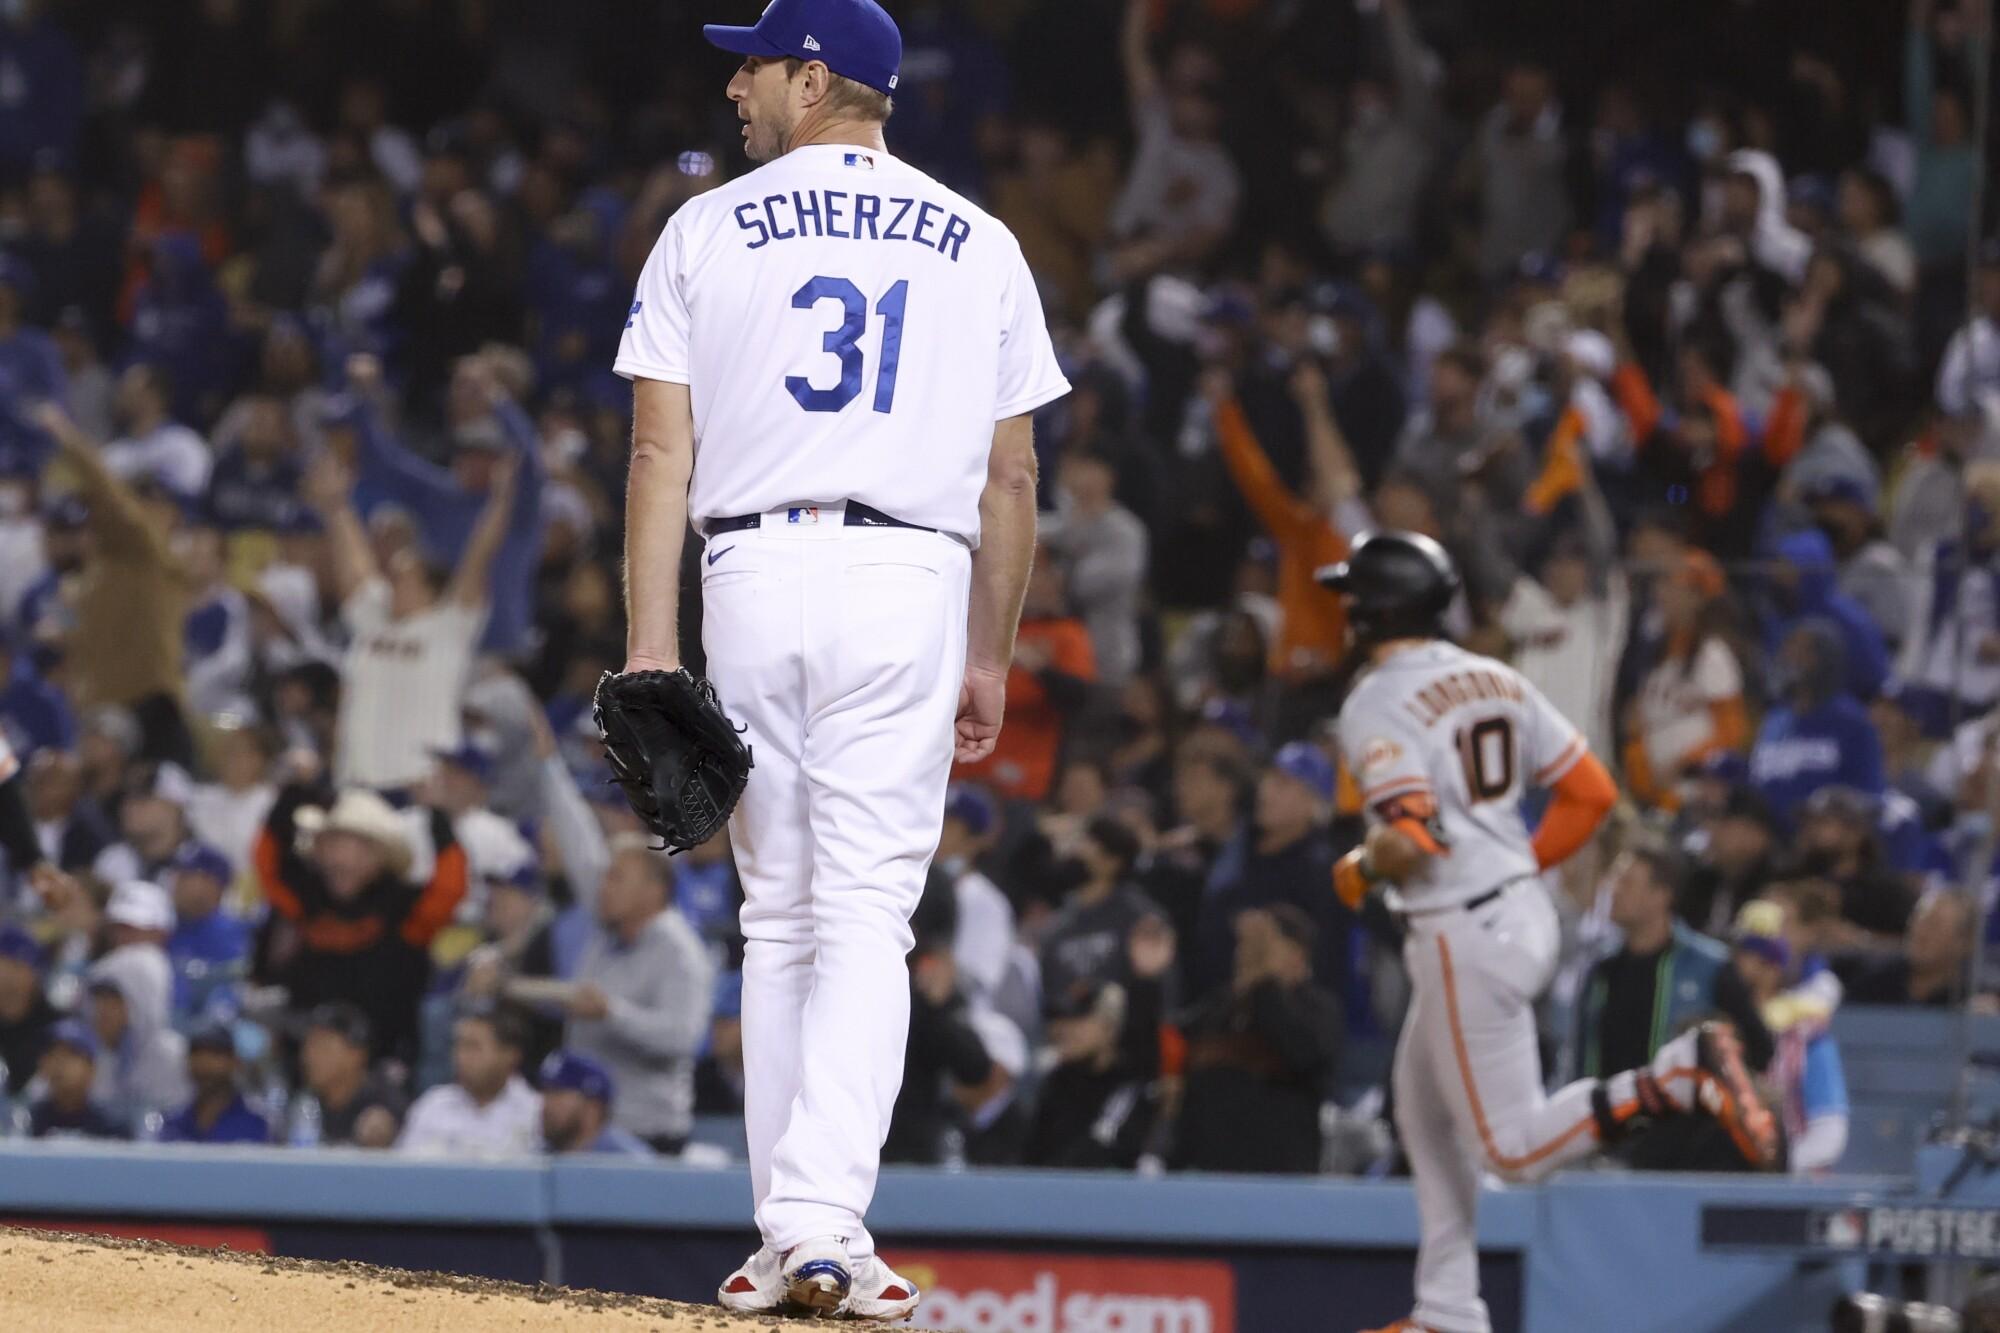 Dodgers starting pitcher Max Scherzer looks back after giving up home run.